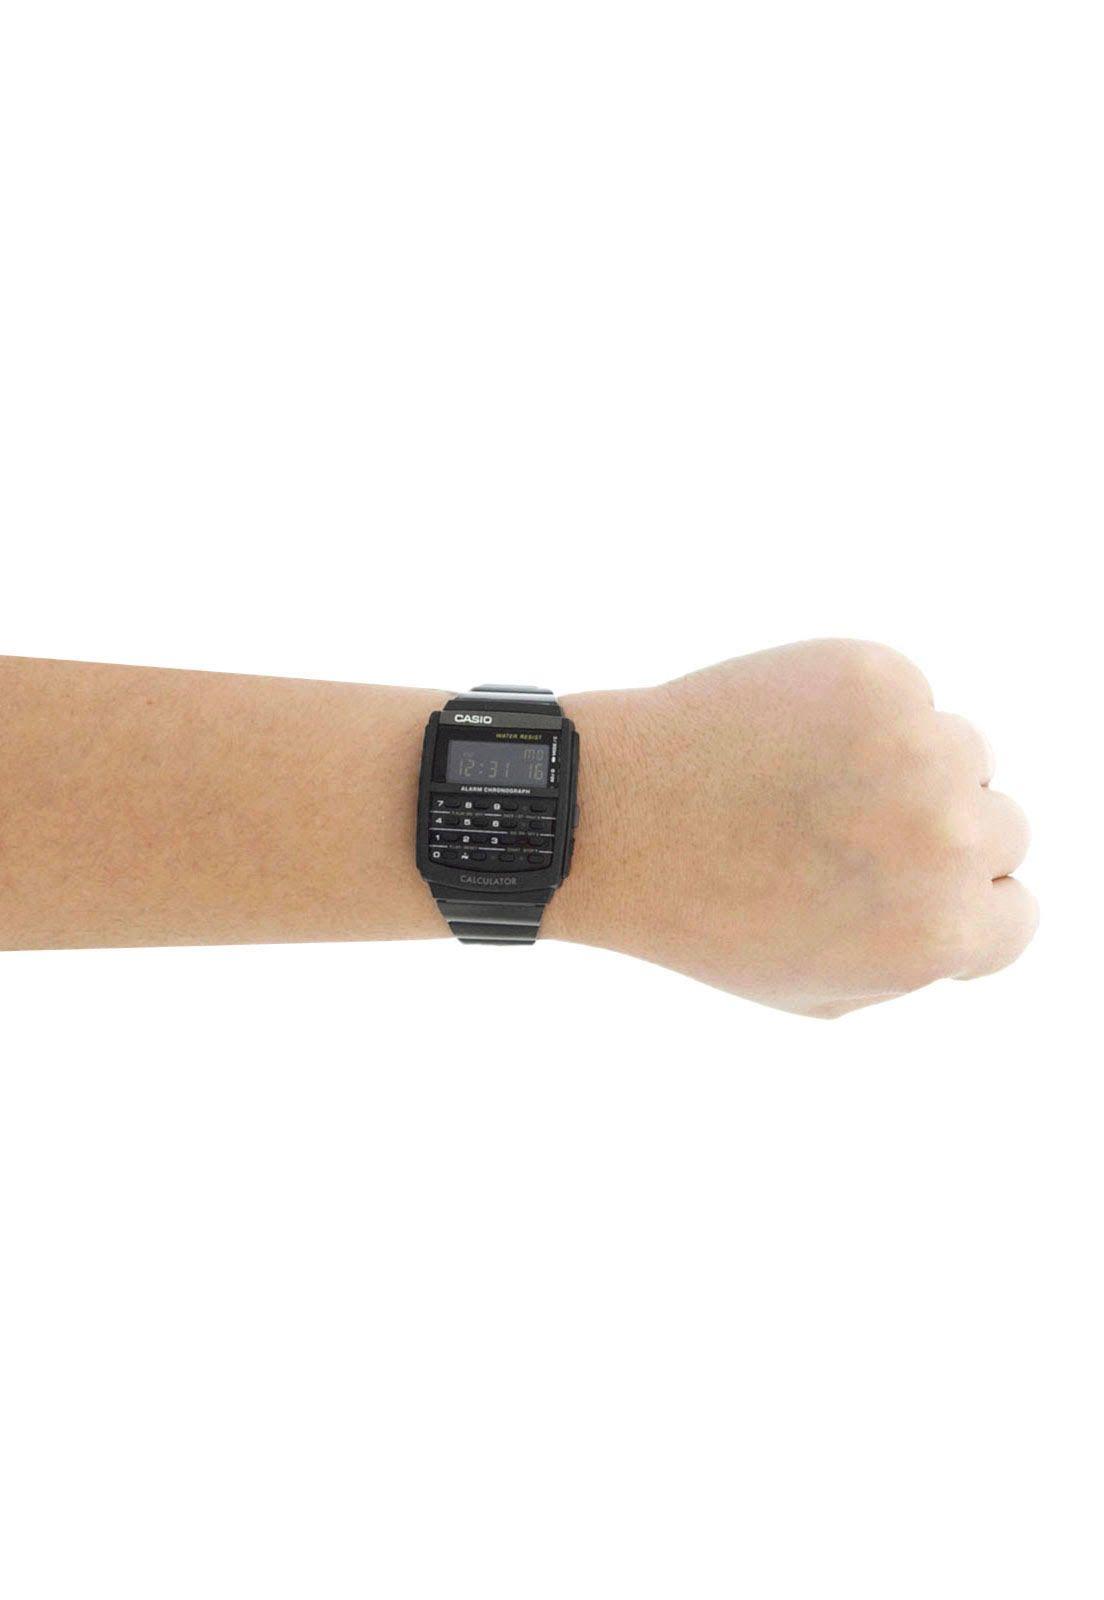 83a7add1268 Relógio Casio Masculino Vintage Calculadora CA-506B-1ADF - Relógios ...